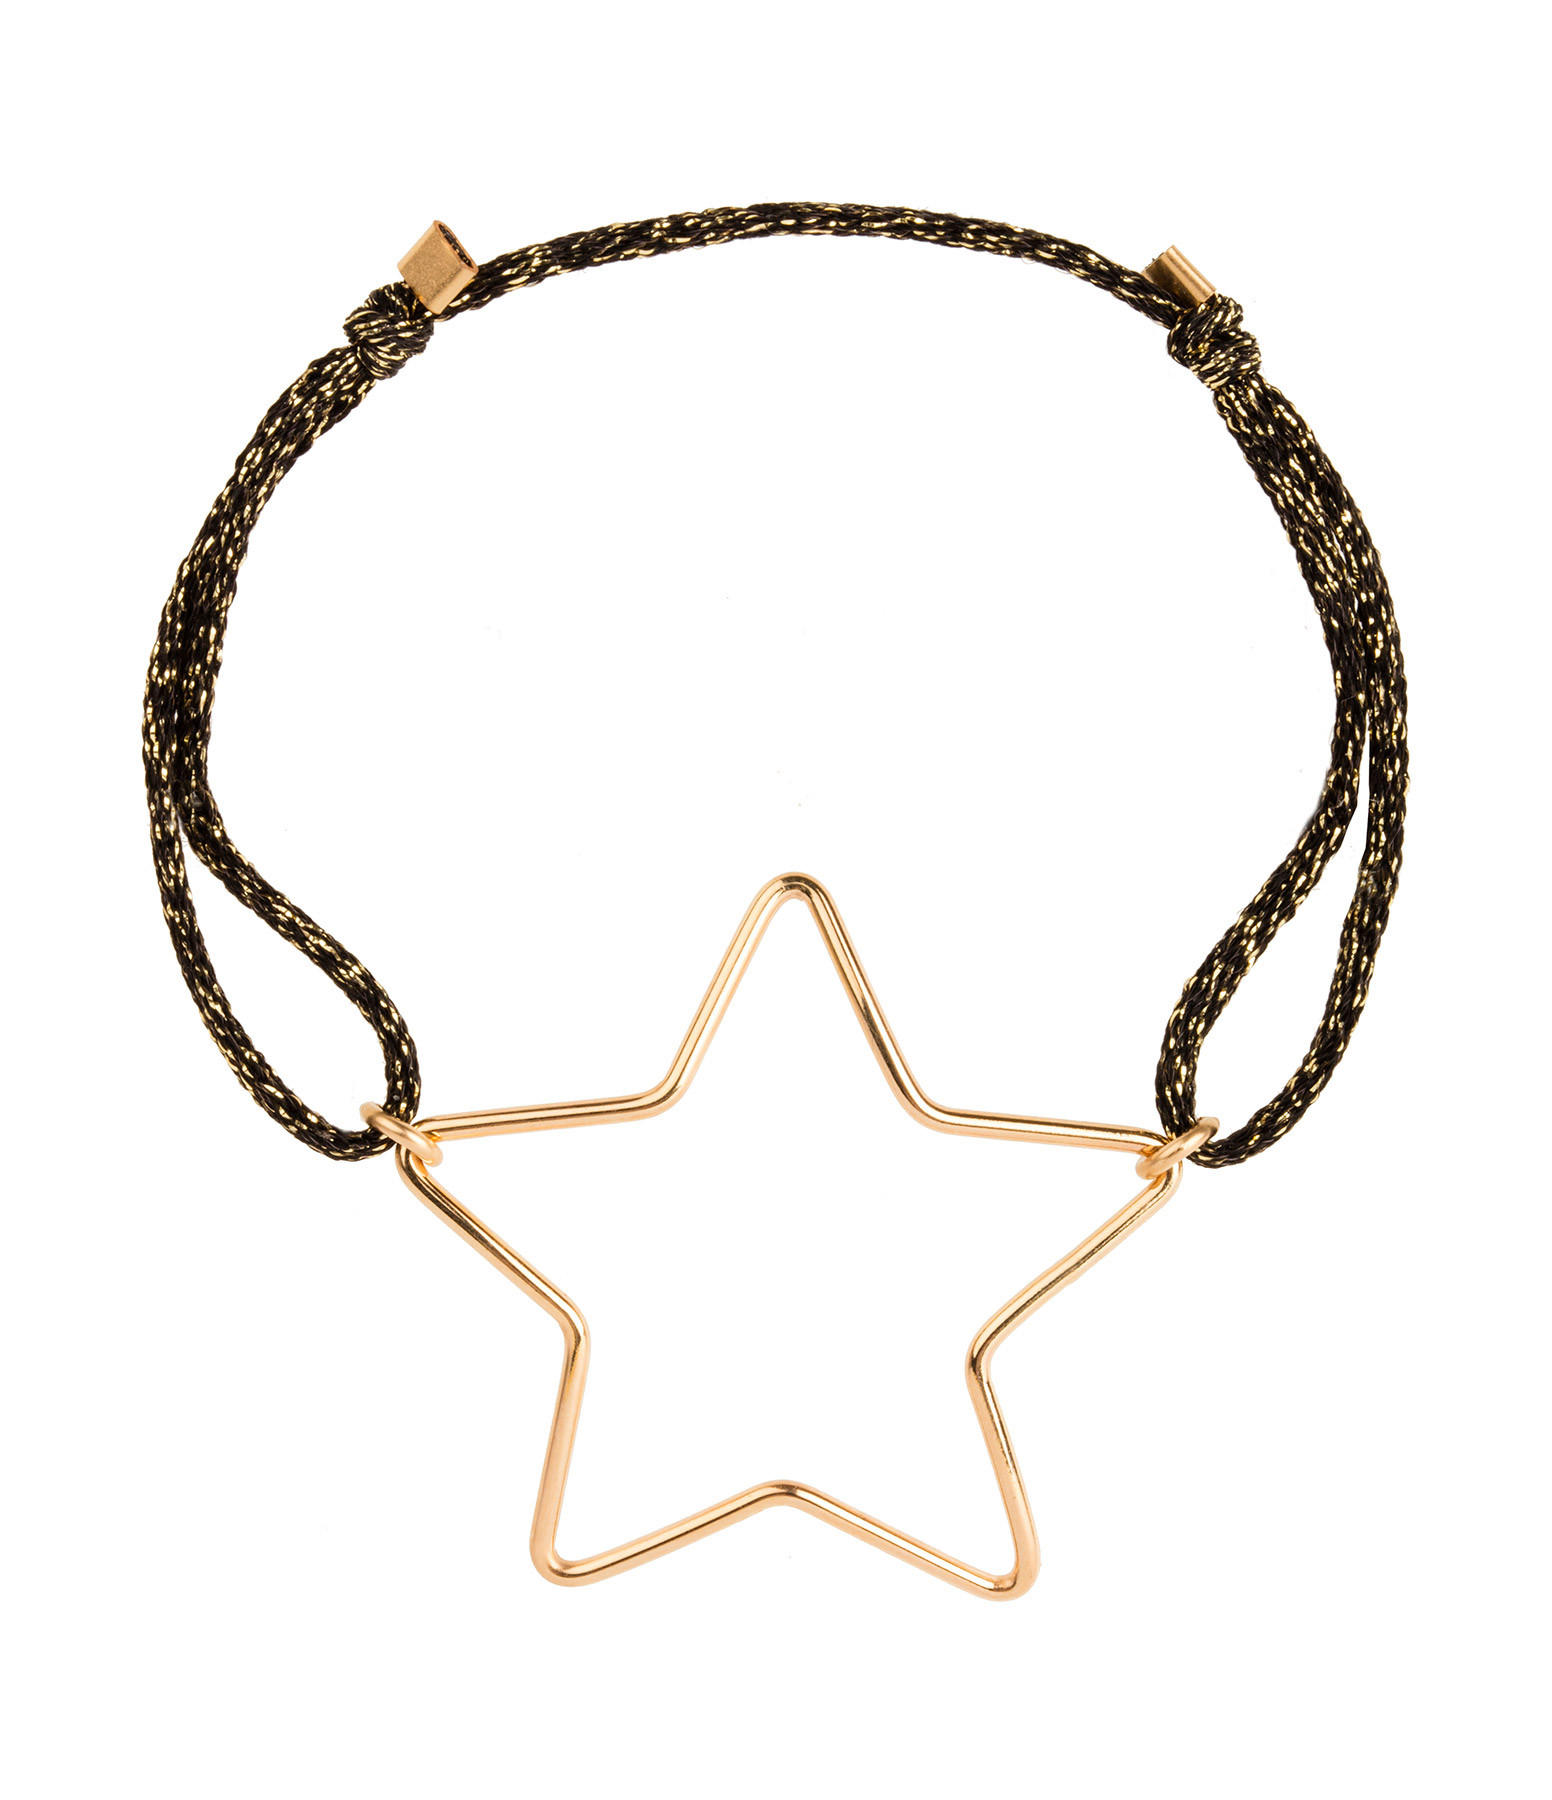 ATELIER PAULIN - Bracelet Cordon Stardust Big Star Gold Filled 14K